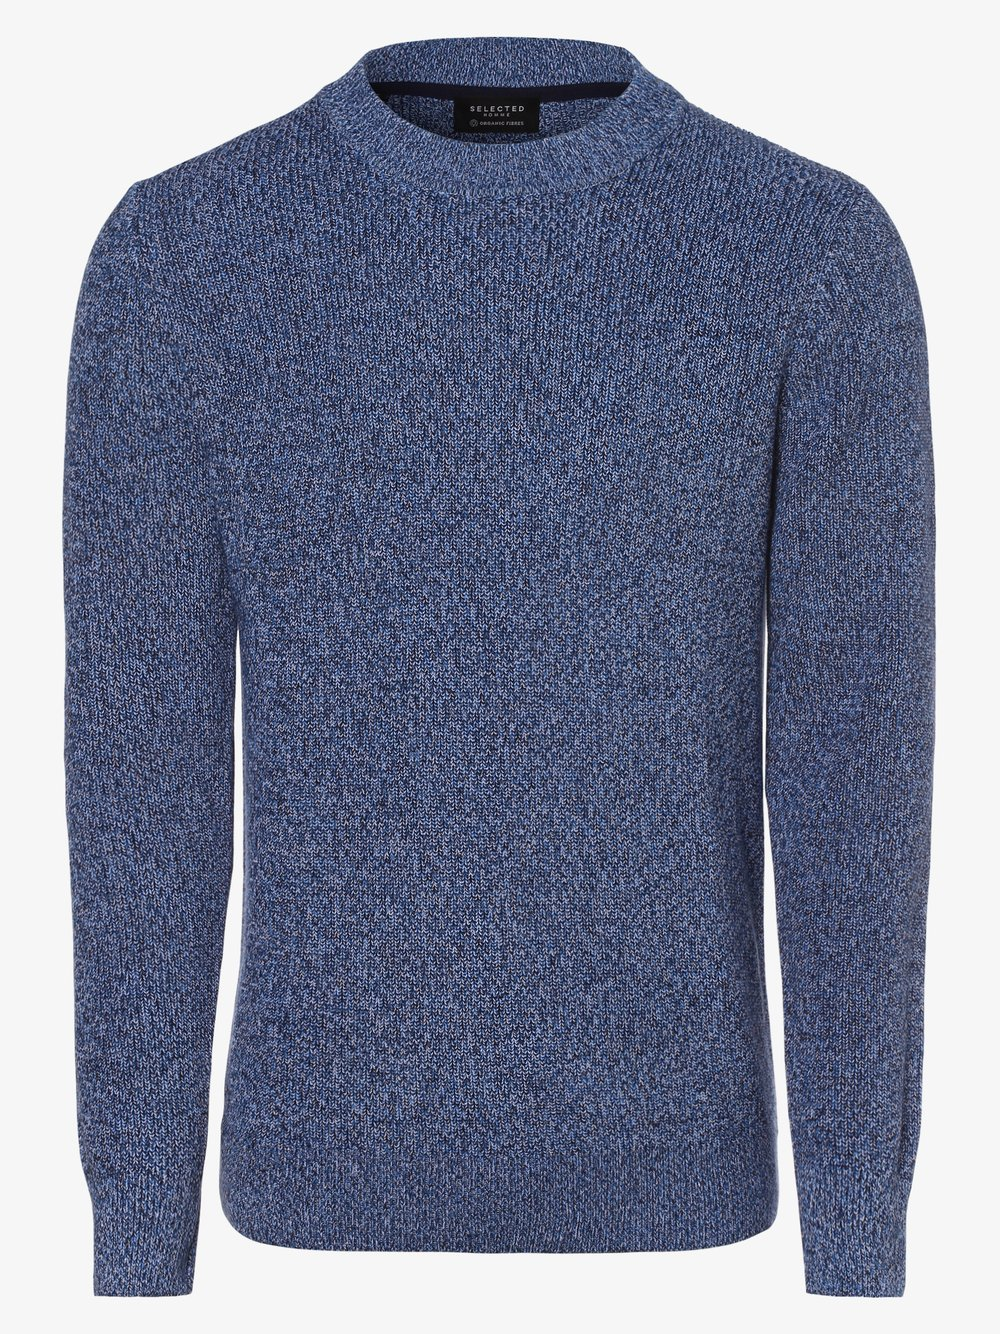 Selected - Sweter męski – Slhmulti, niebieski